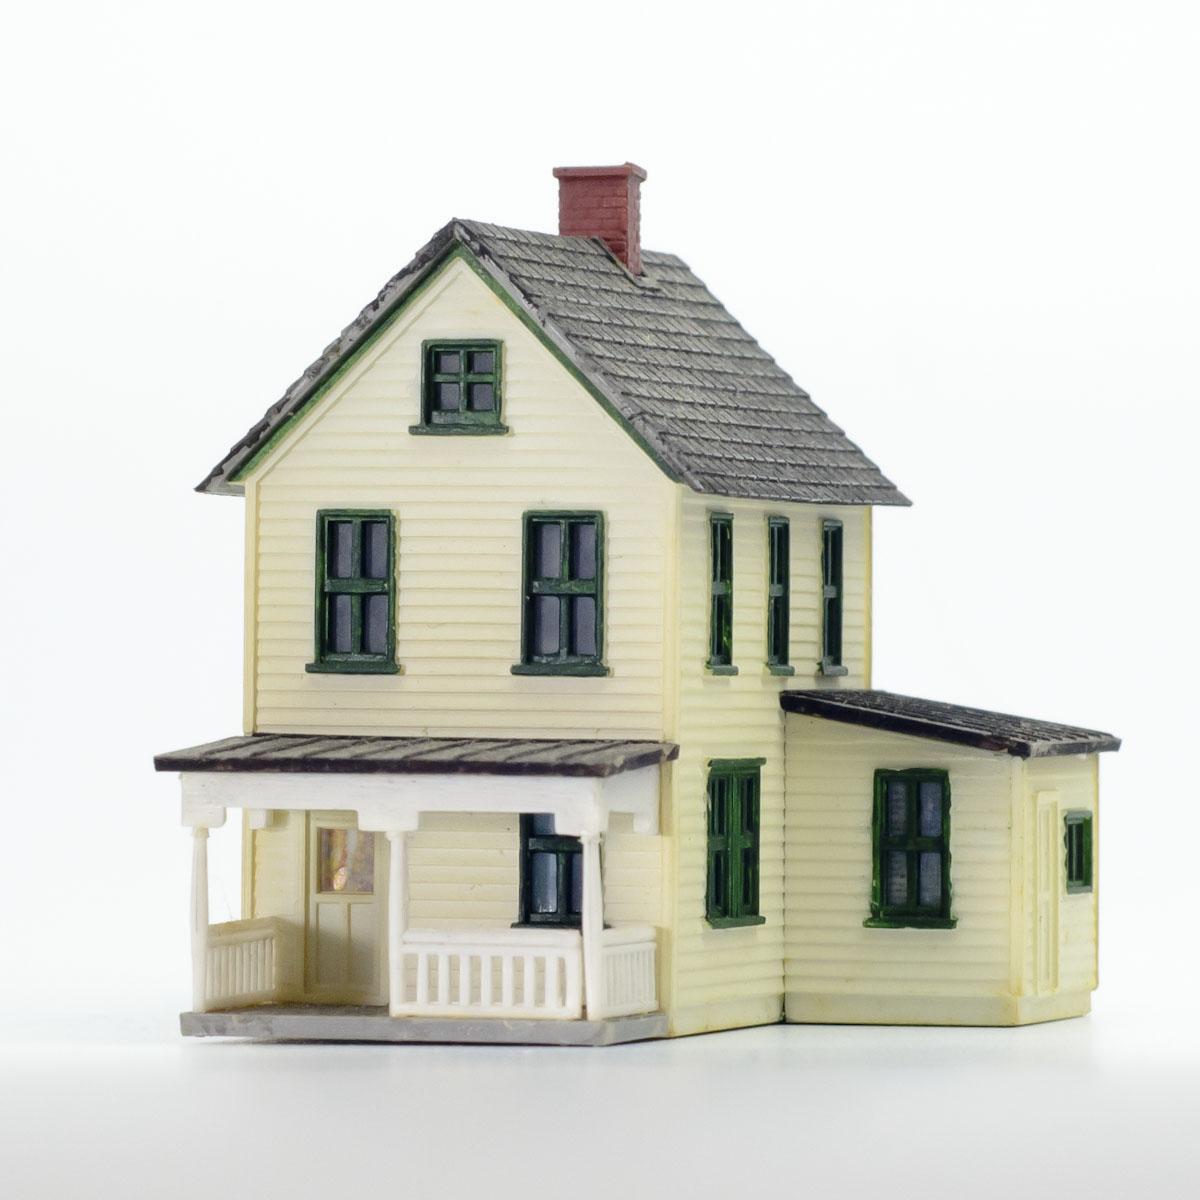 N scale for sale model power 1513 farm house for Farm house model